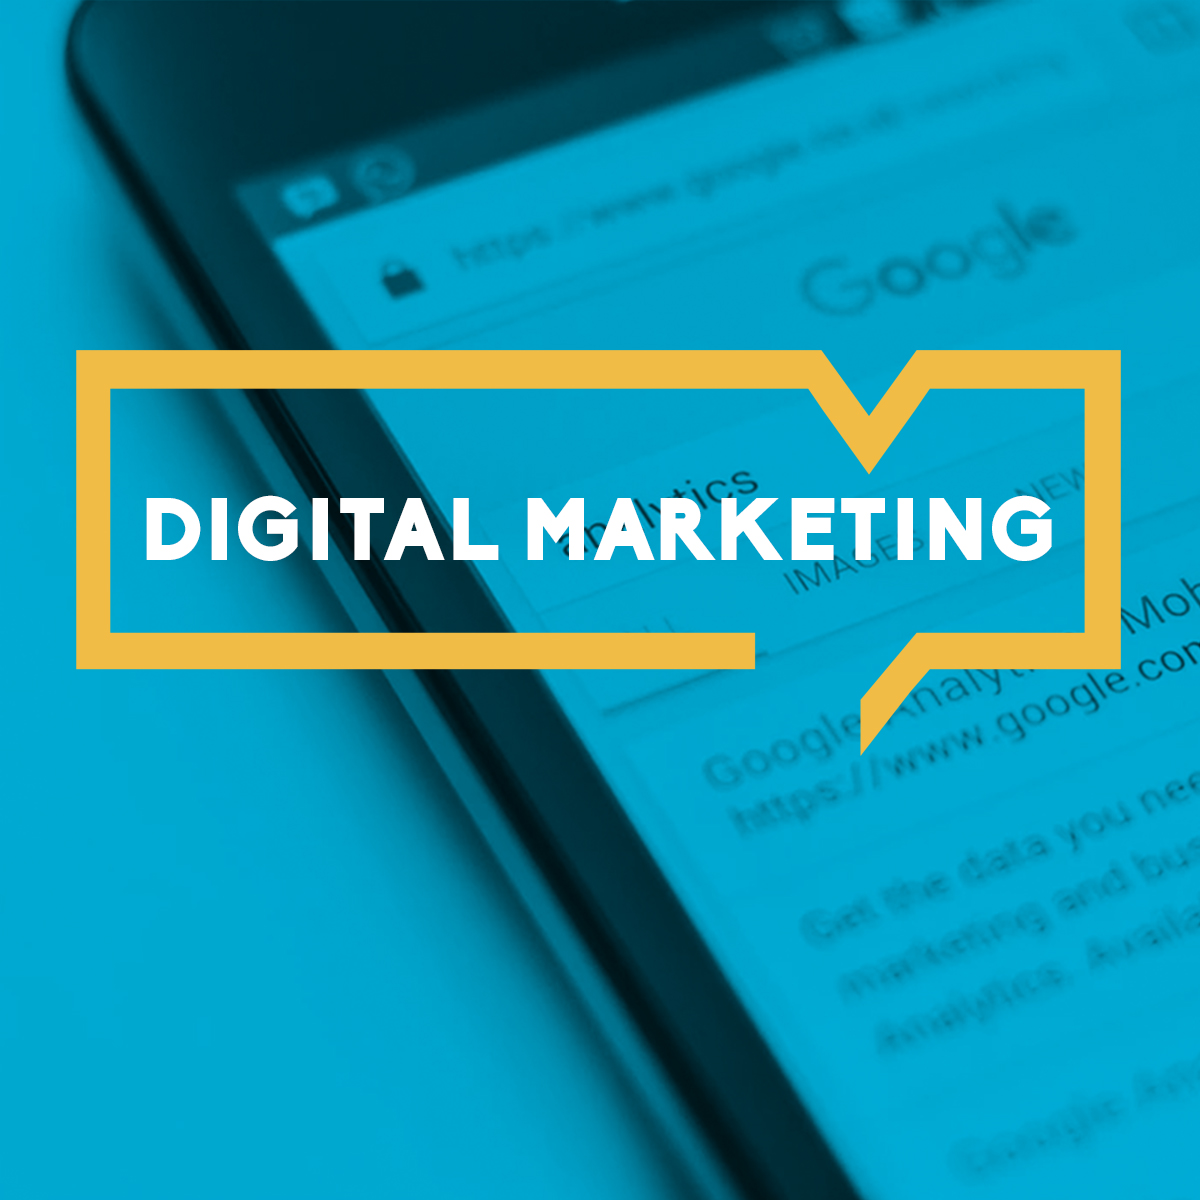 digital-marketing-strategy-microlimano